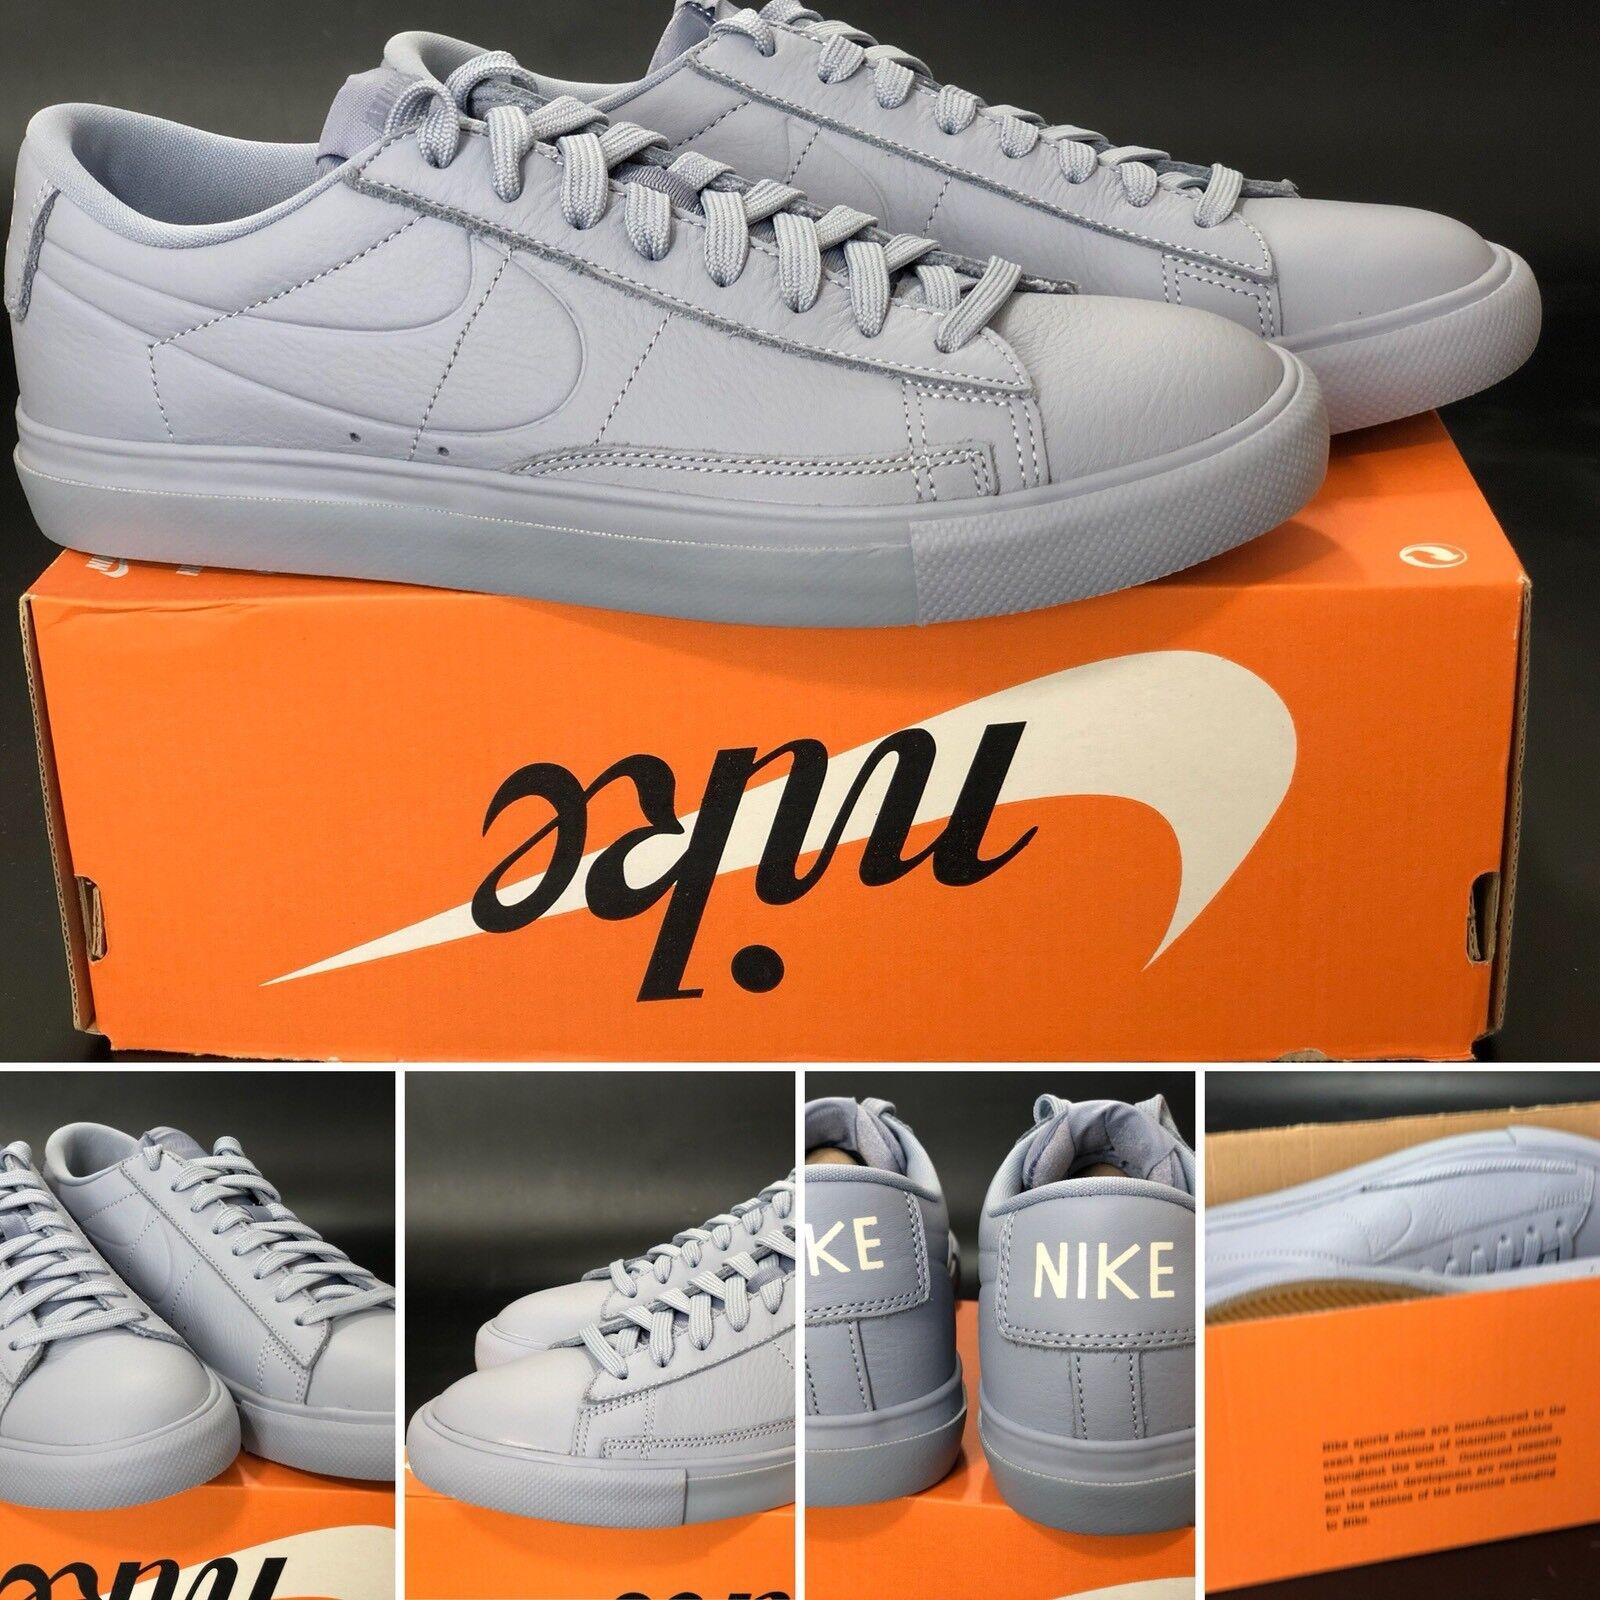 Nike blazer ghiacciaio grey dimensioni uk6 / us7 / eur40 / cm25 371760-025